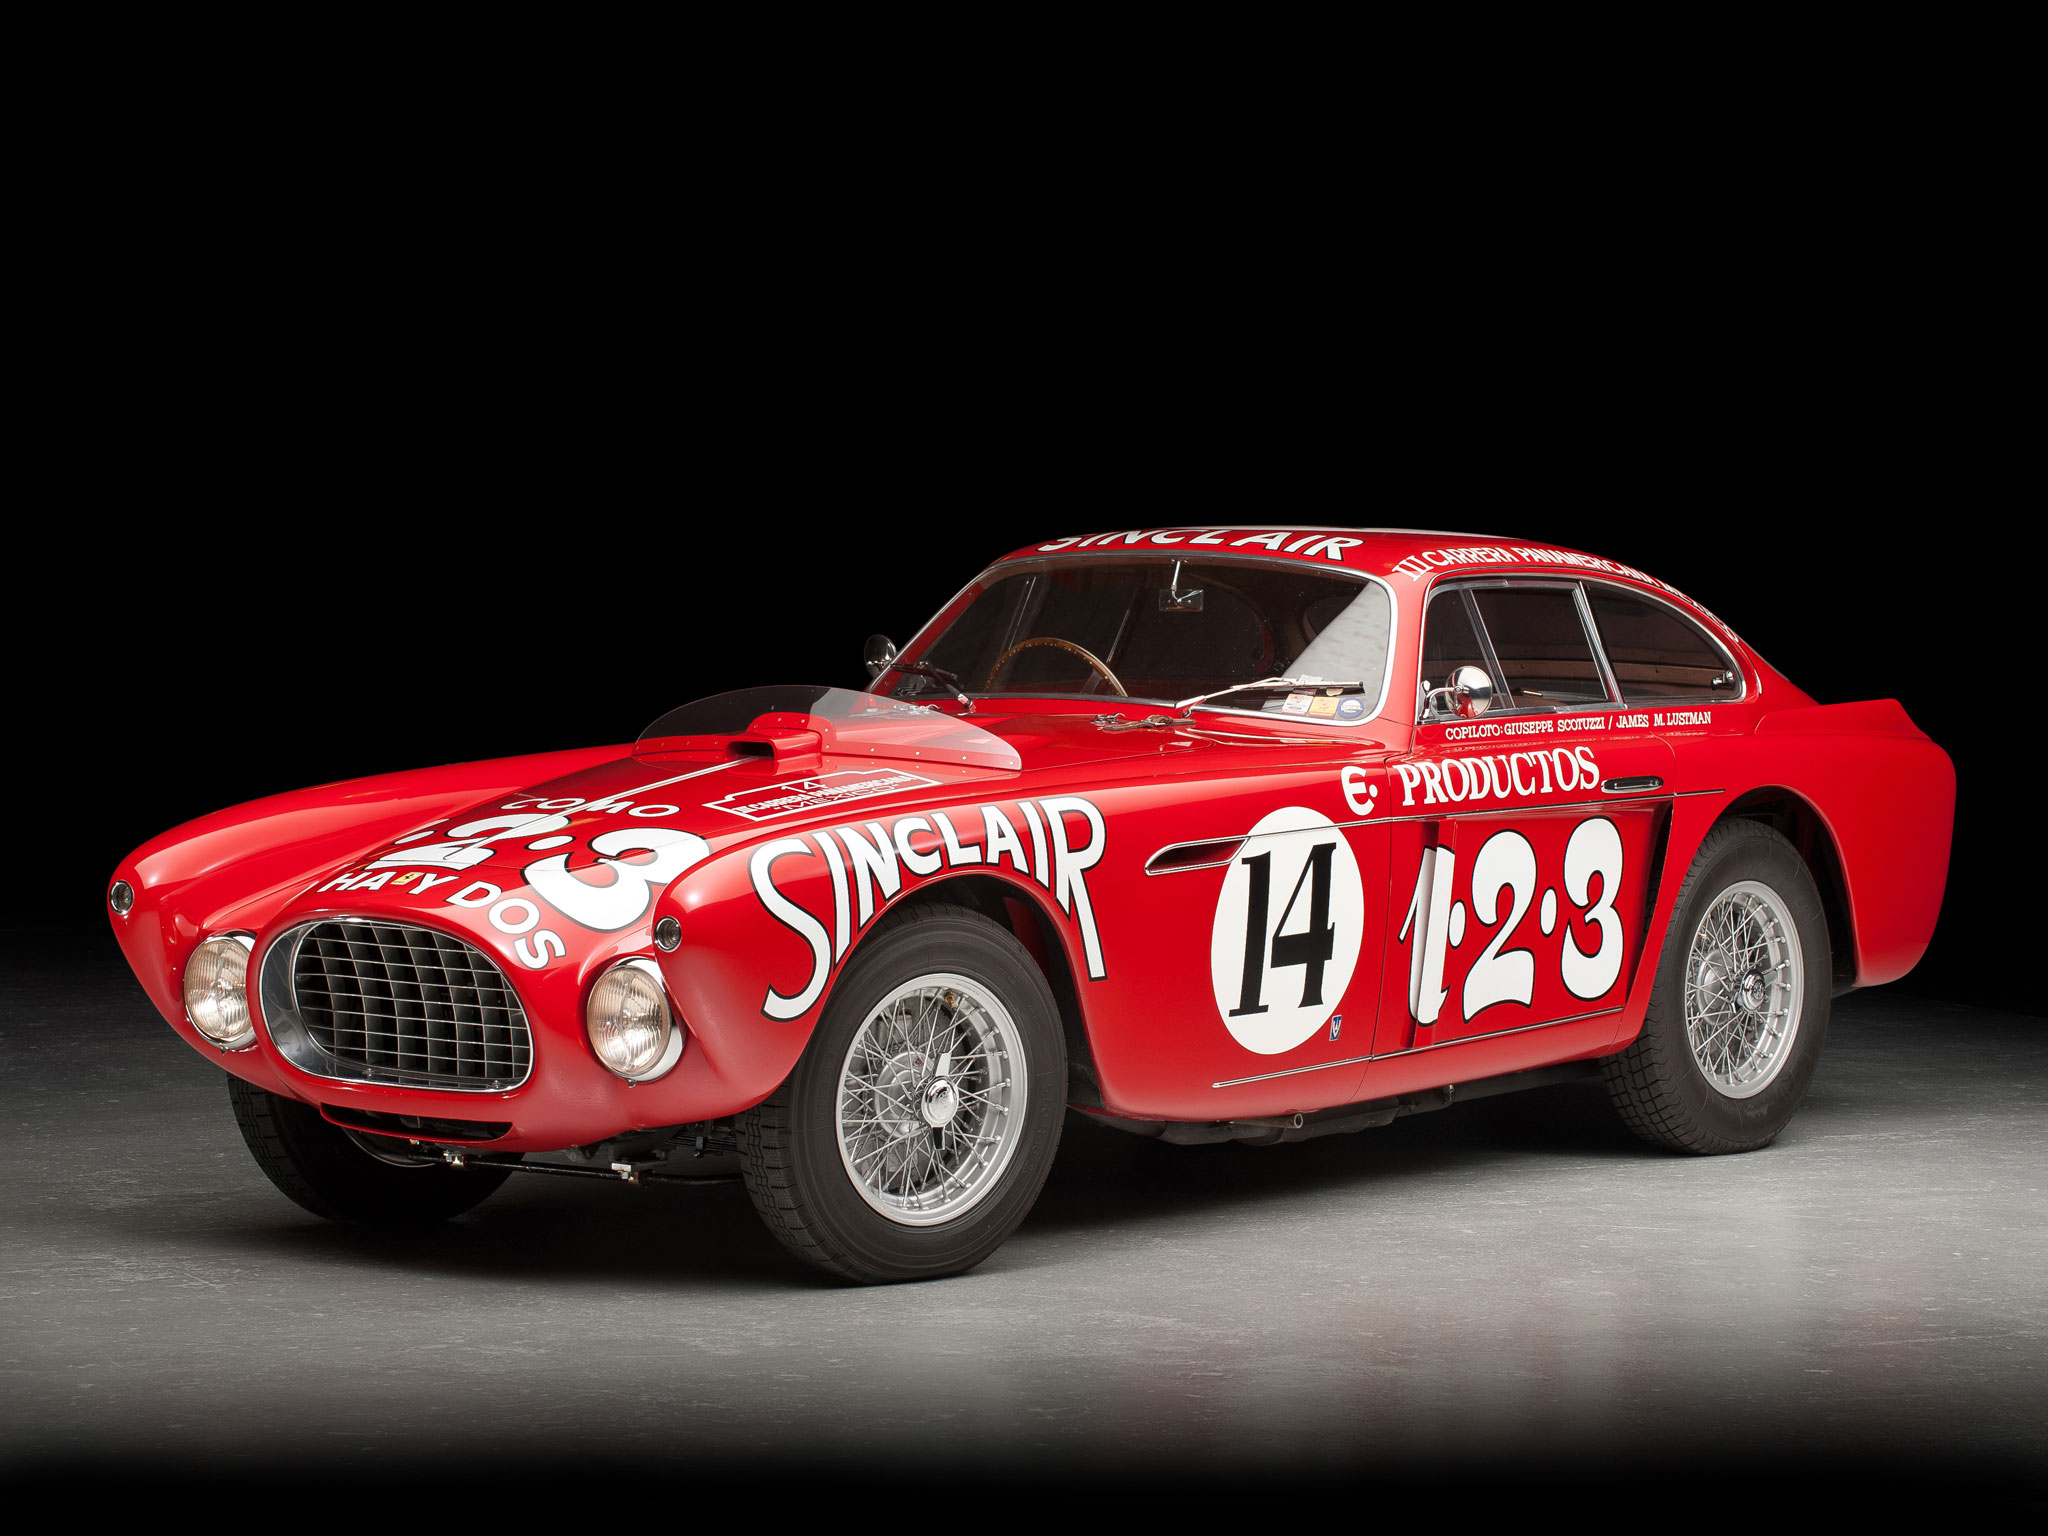 http://www.extravaganzi.com/wp-content/uploads/2011/07/1952-Ferrari-340-Mexico-Berlinetta-by-Vignale-11.jpg